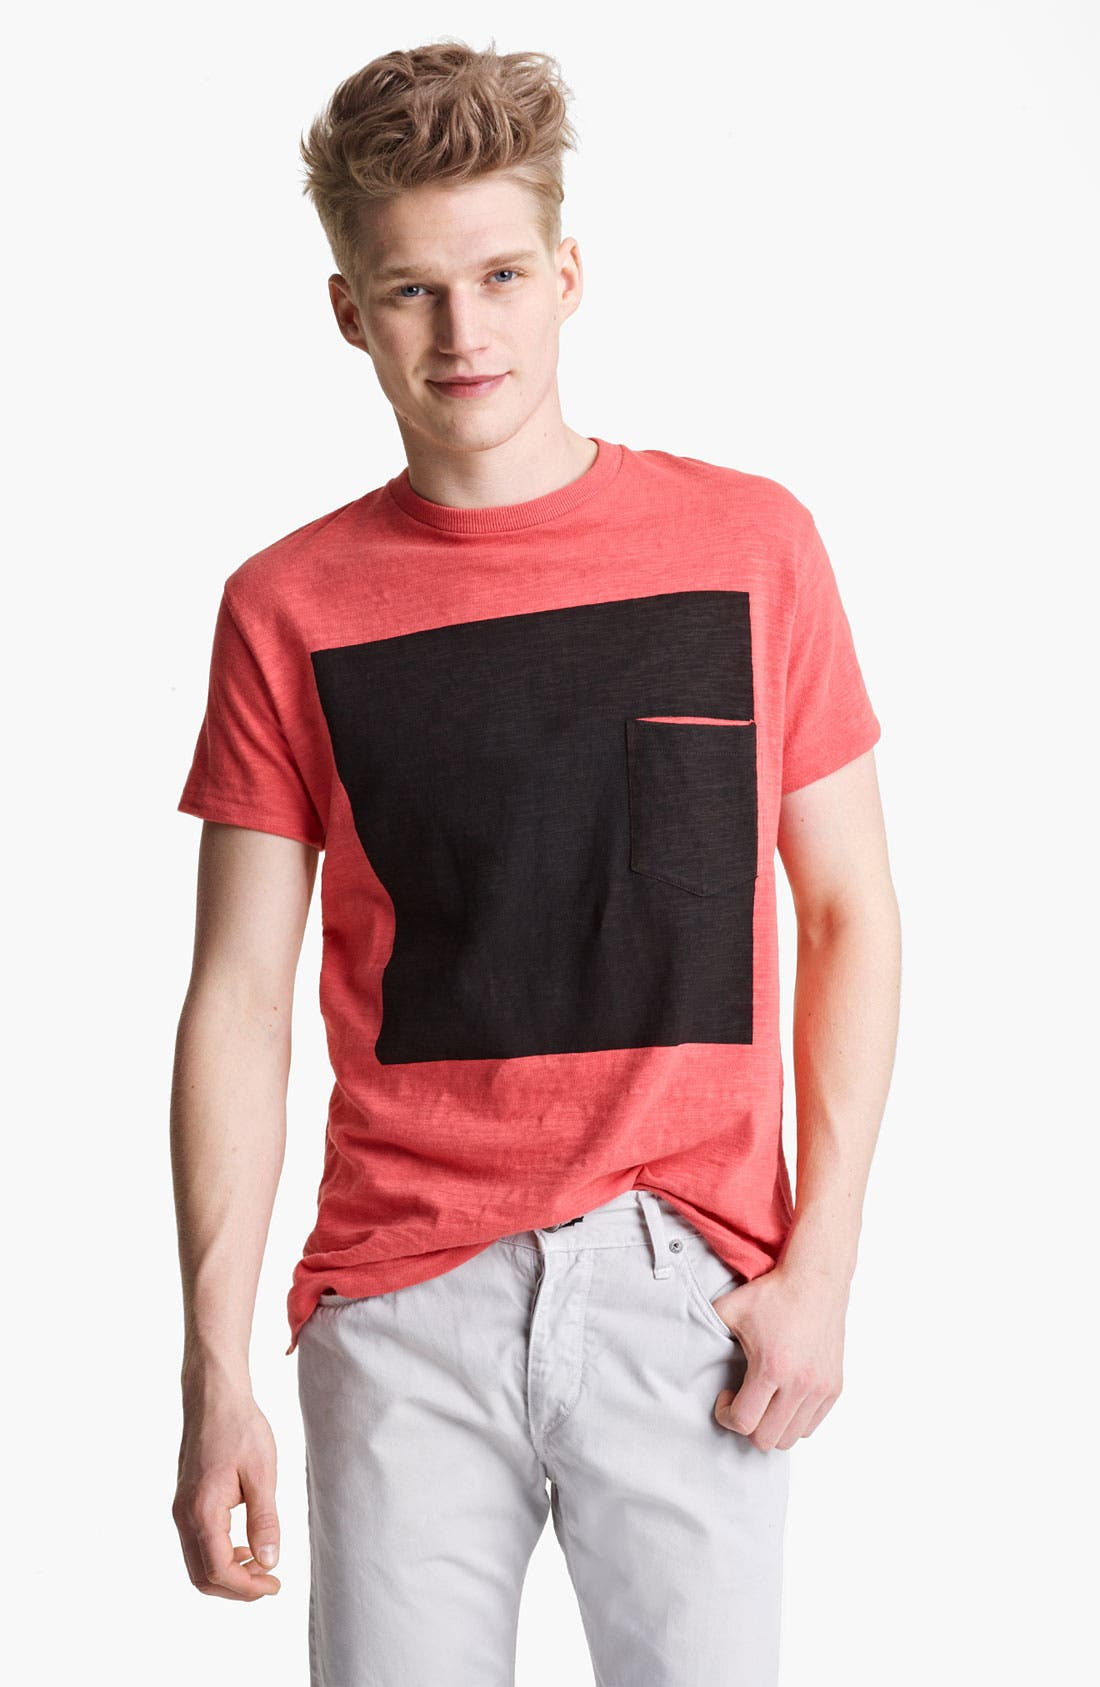 Alternate Image 1 Selected - rag & bone Square Print Graphic T-Shirt